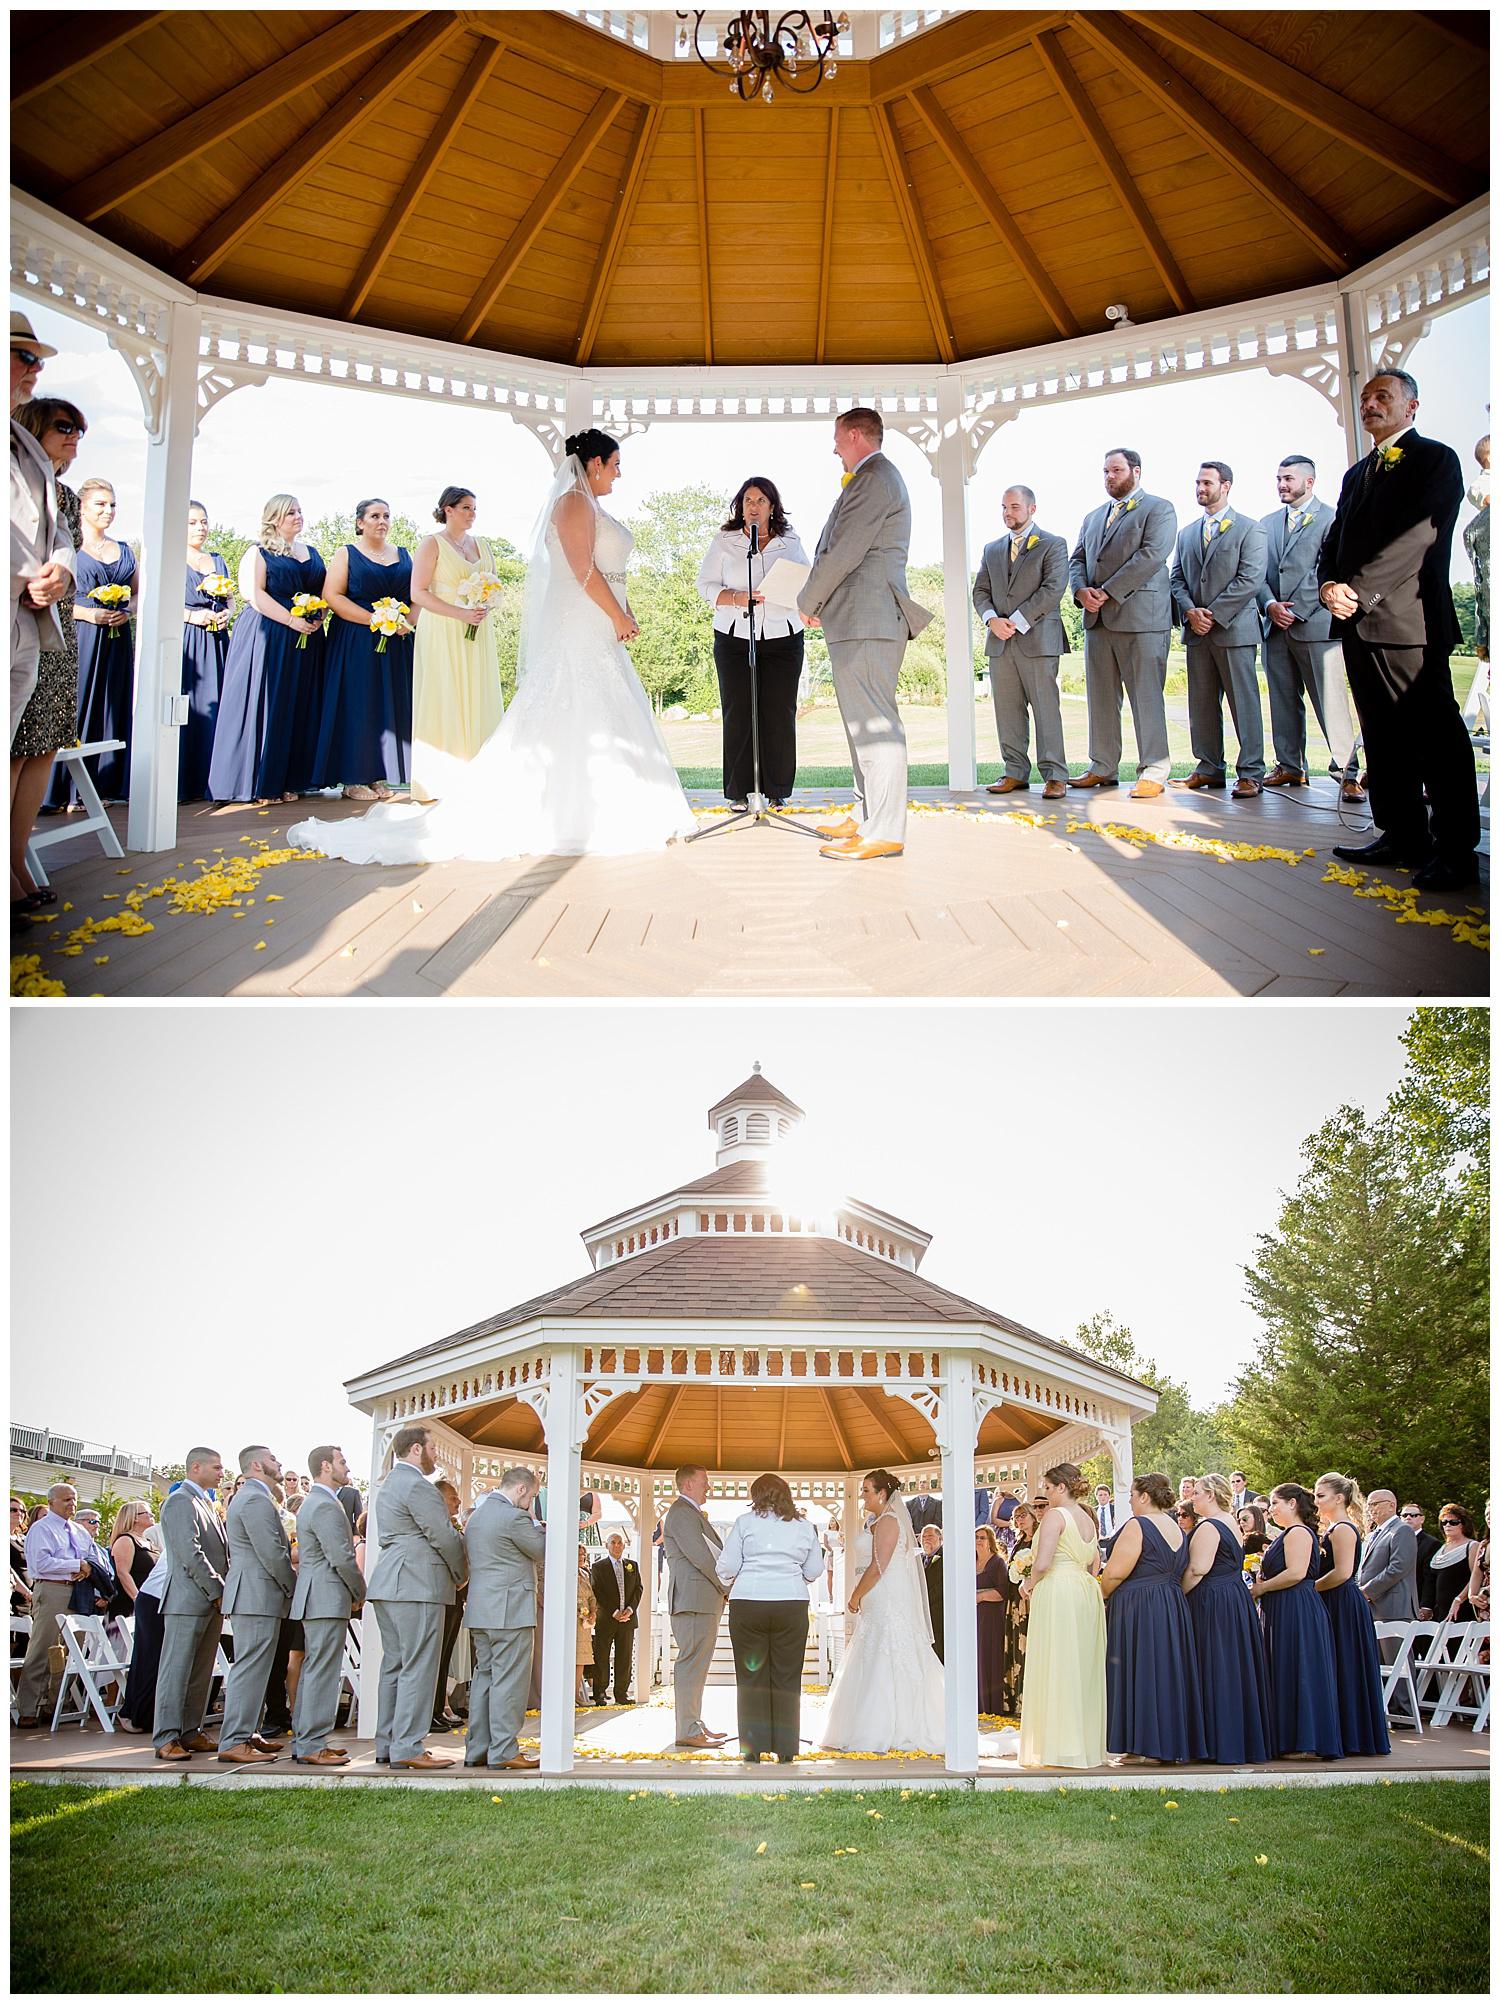 Hillside-Country-Club-Wedding-Photography-26-North-Studios-019.j